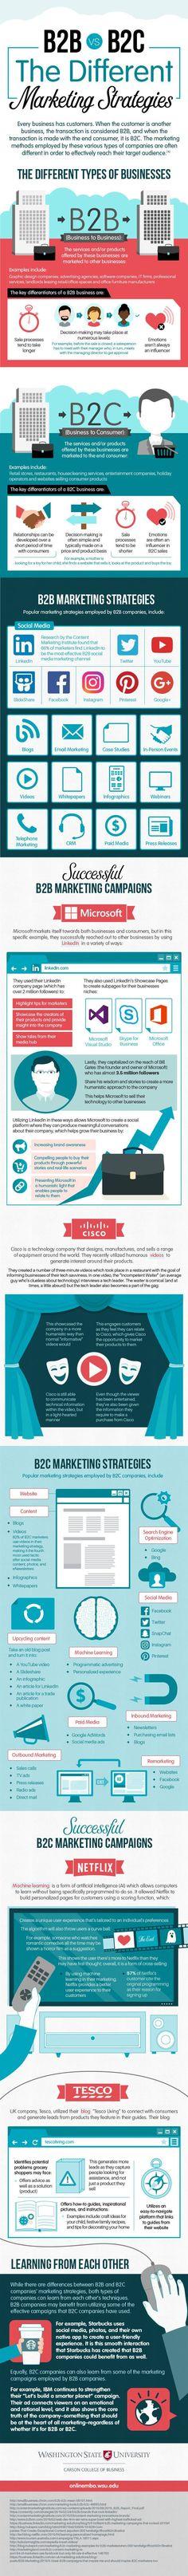 B2B vs B2C: The Different #Marketing Strategies #Infographic @SocialMedia2Day